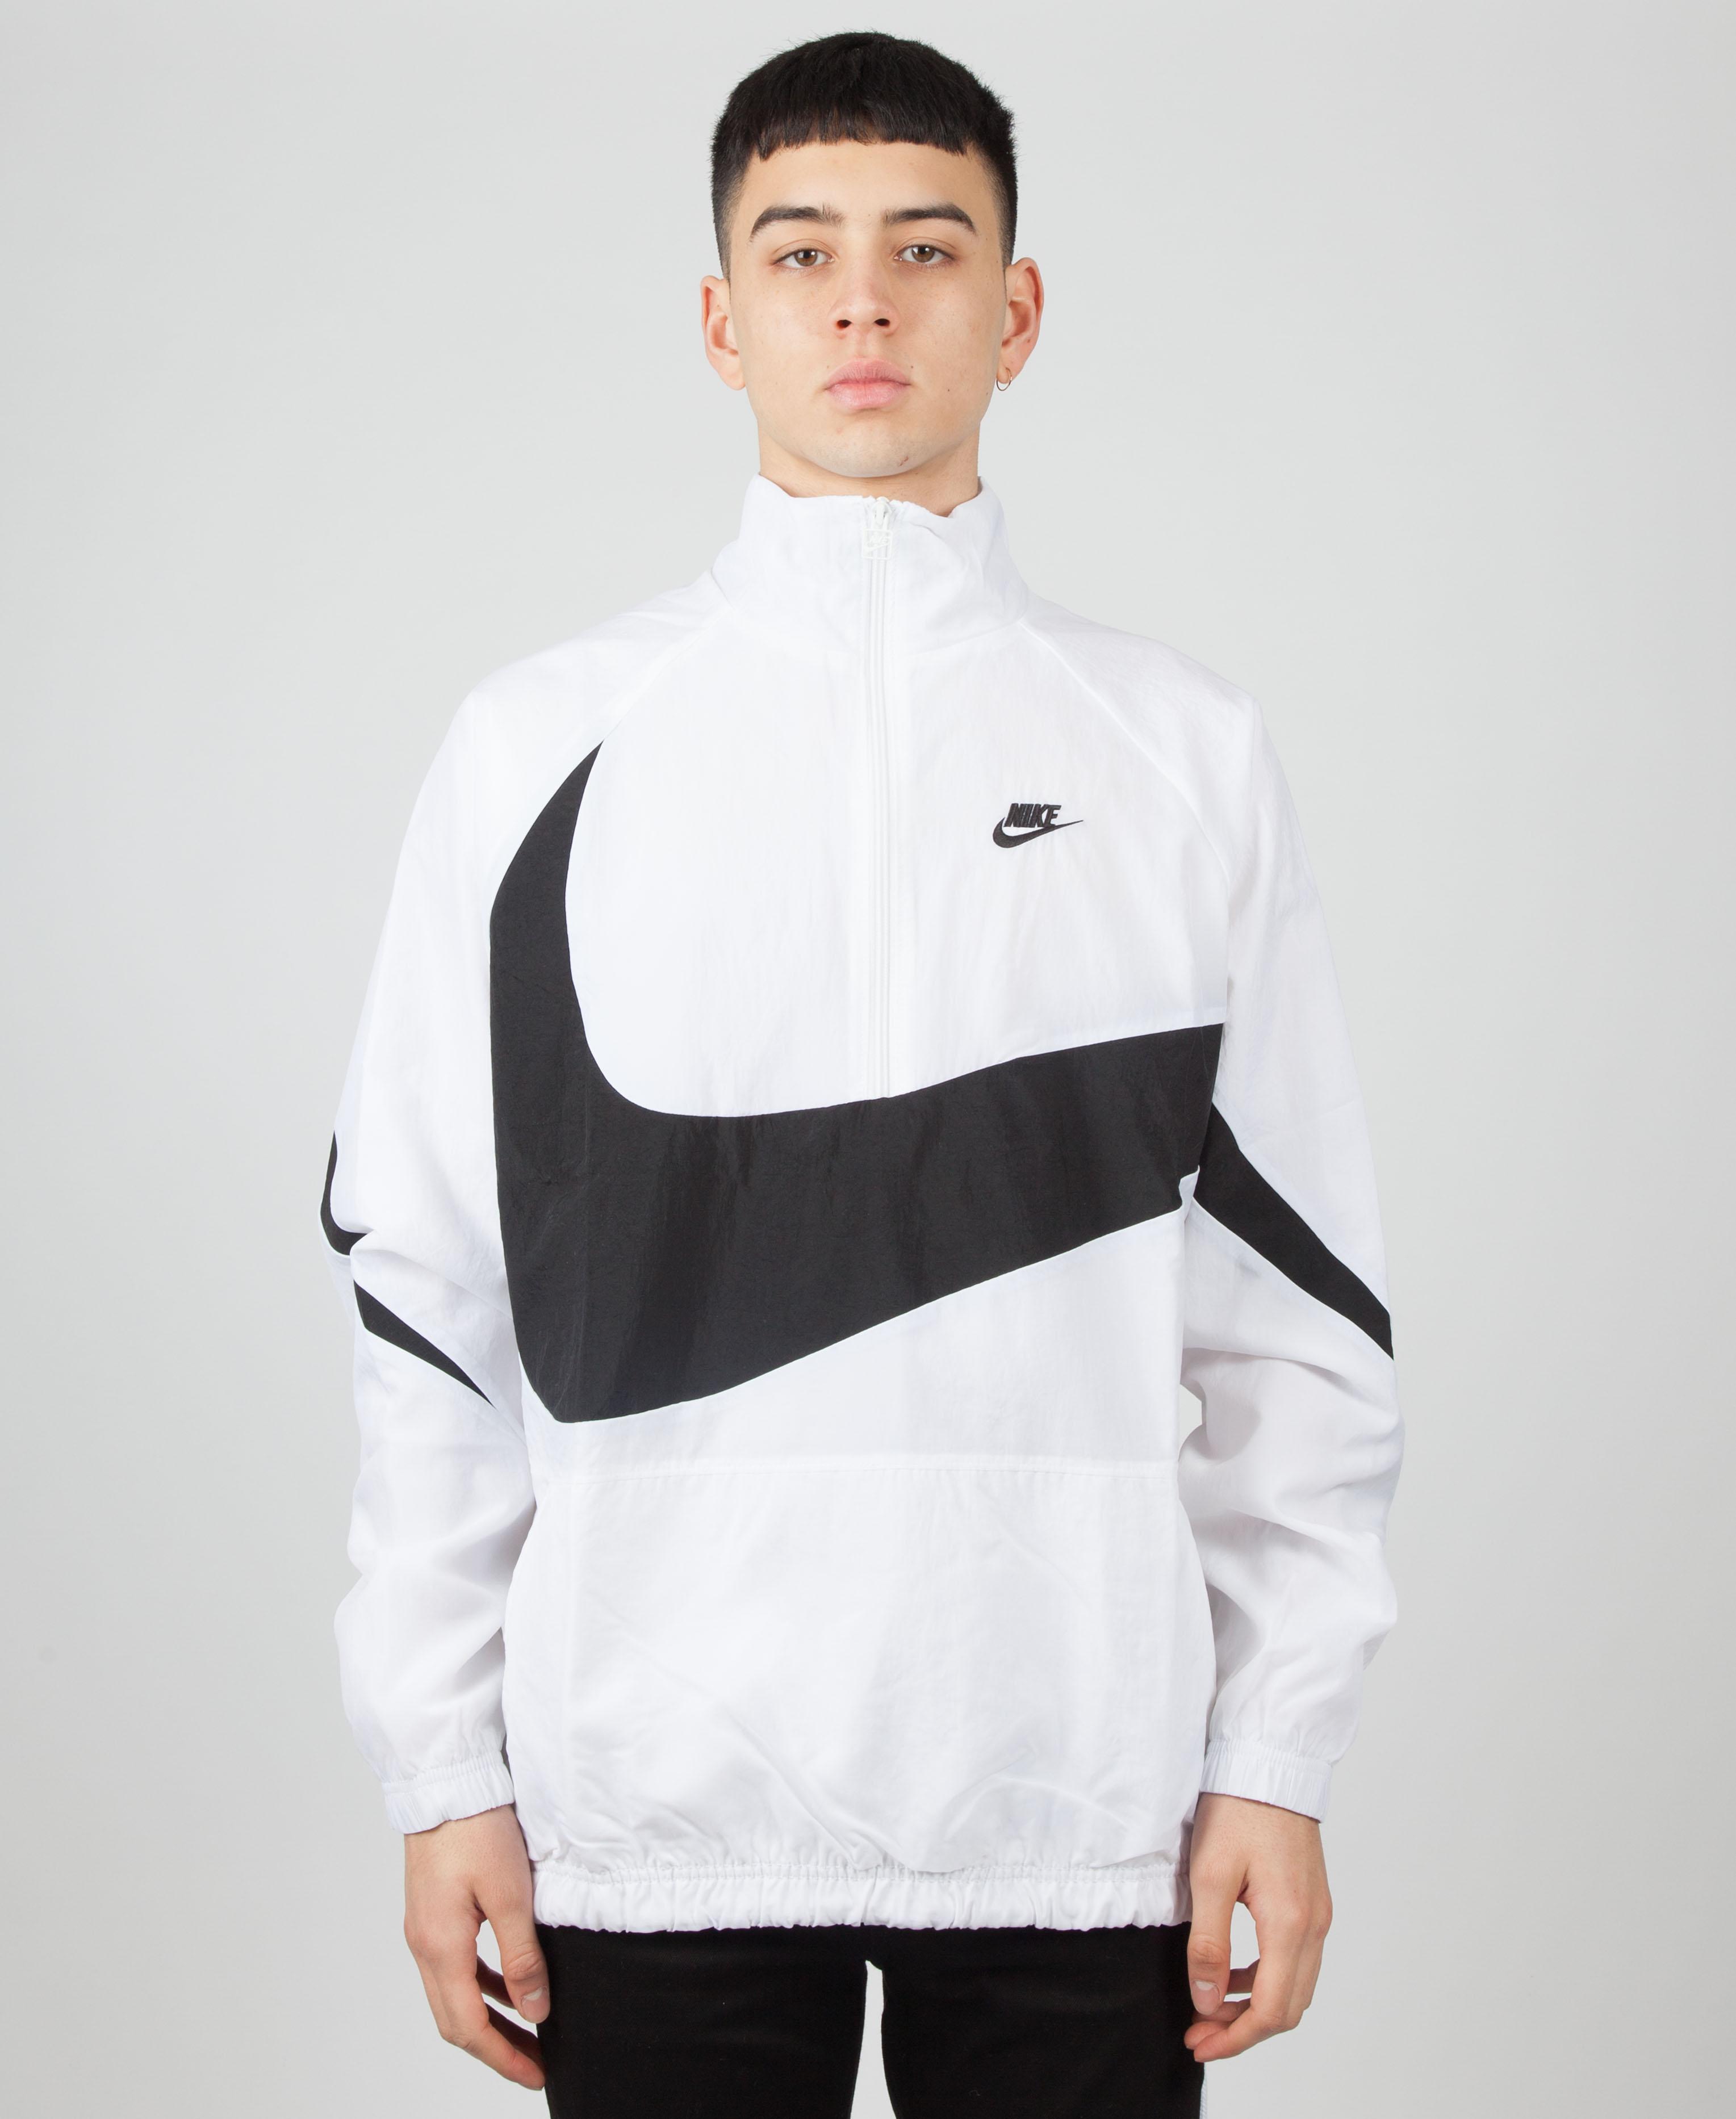 f576469d9baf Nike Vaporwave Packable Half Zip Jacket With Large Swoosh In White ...